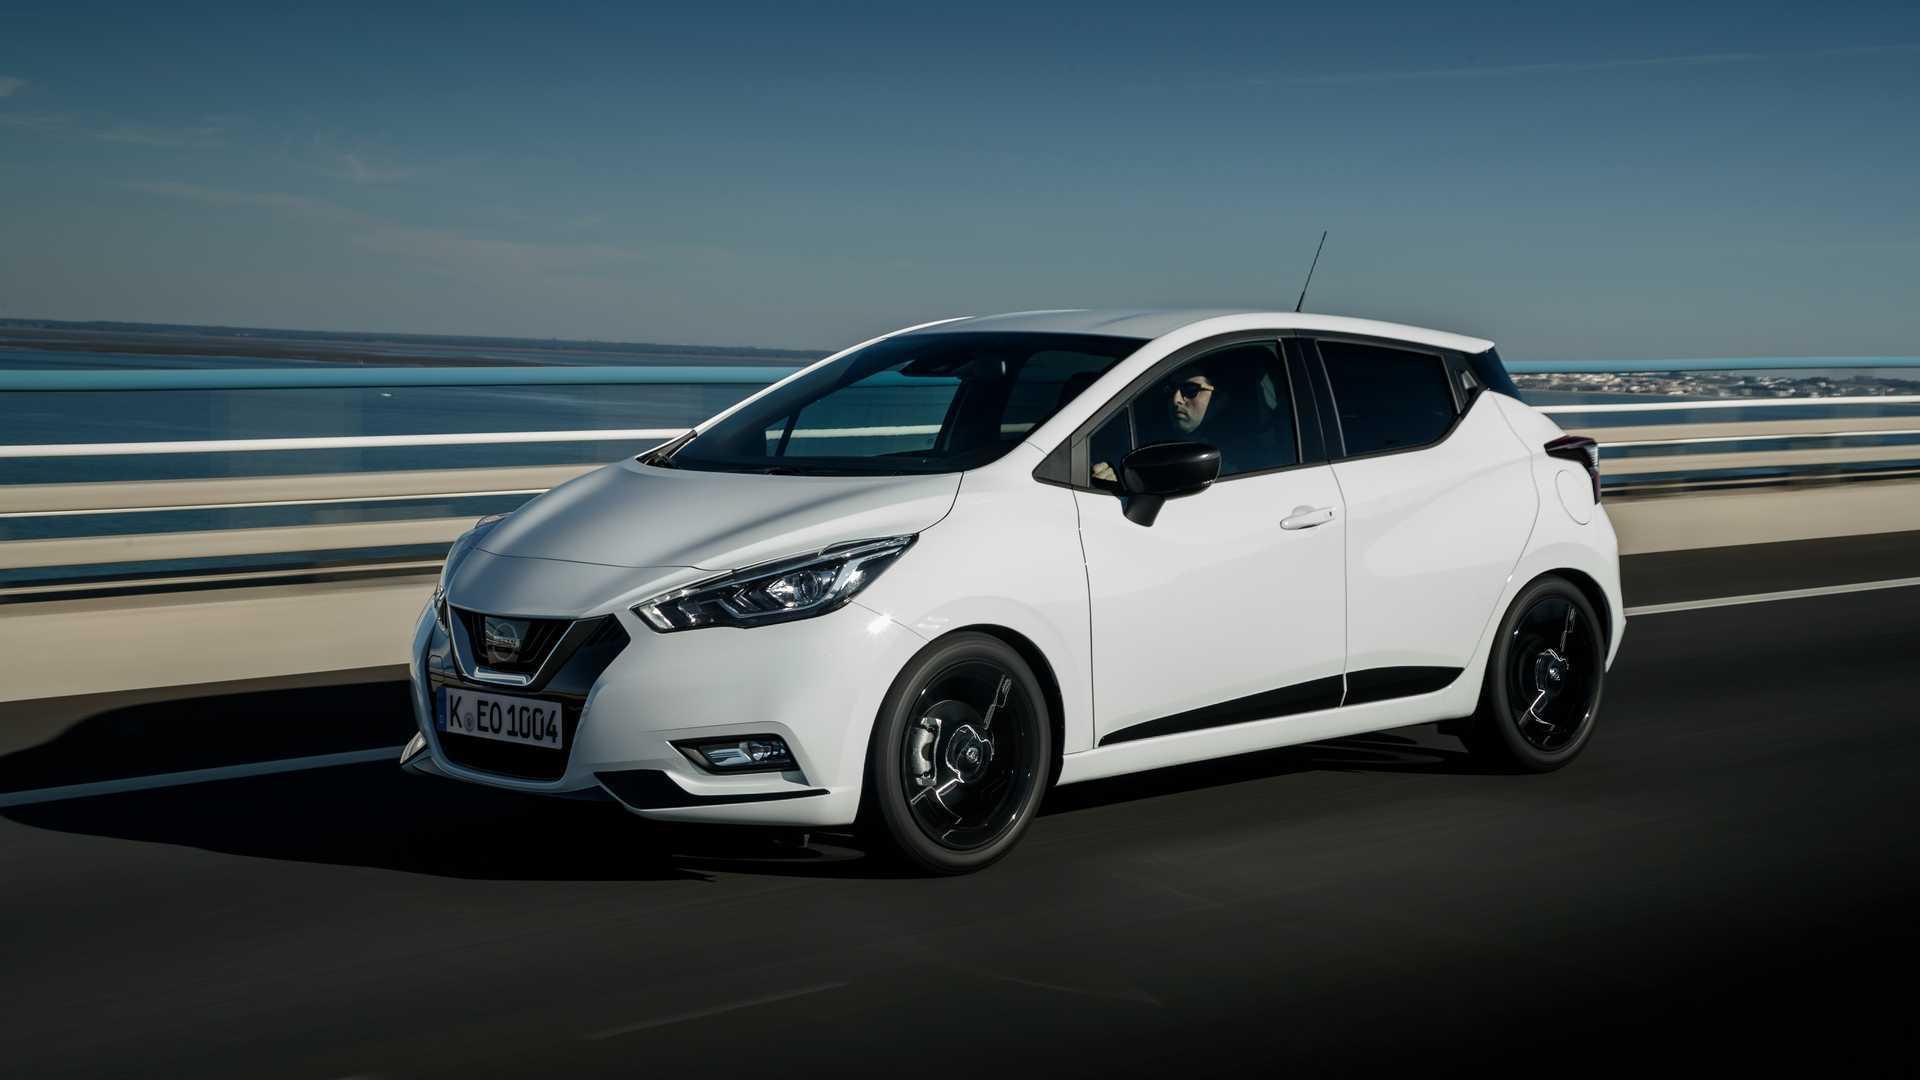 Novo Nissan March Sera Nacional E Versa E Confirmado Para 2020